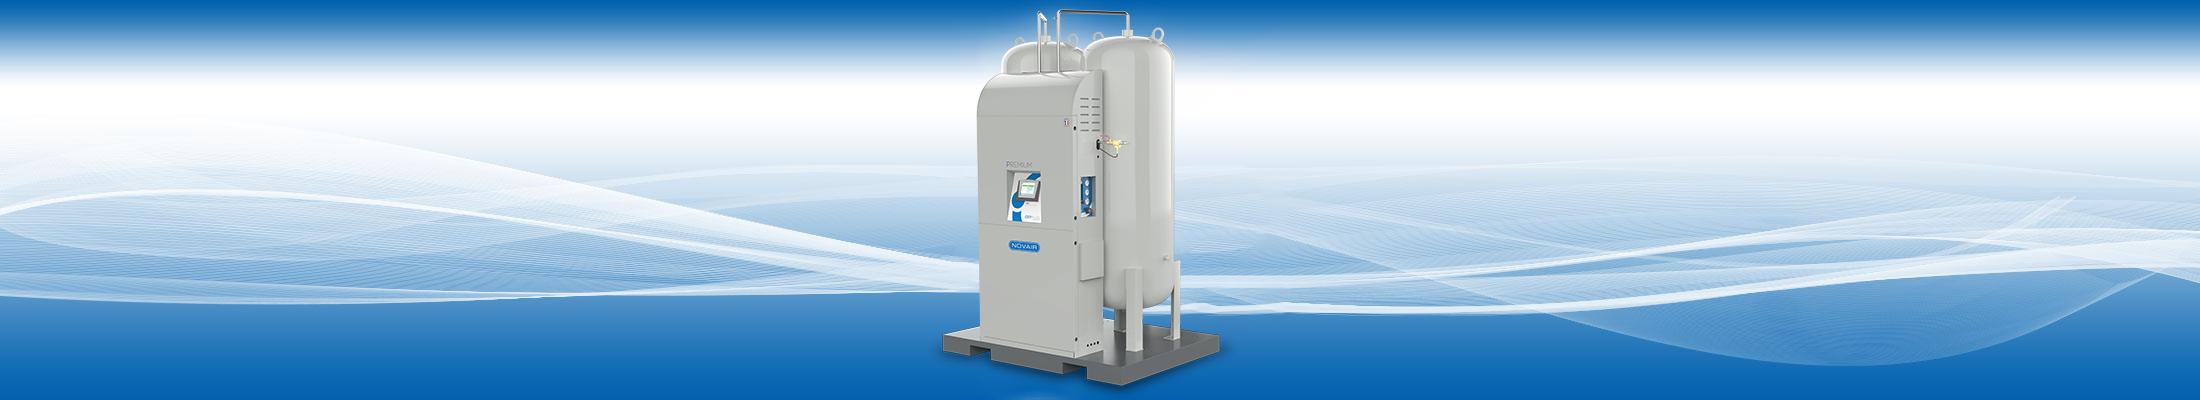 95%% - Twin Tower PSA Oxygen Generator